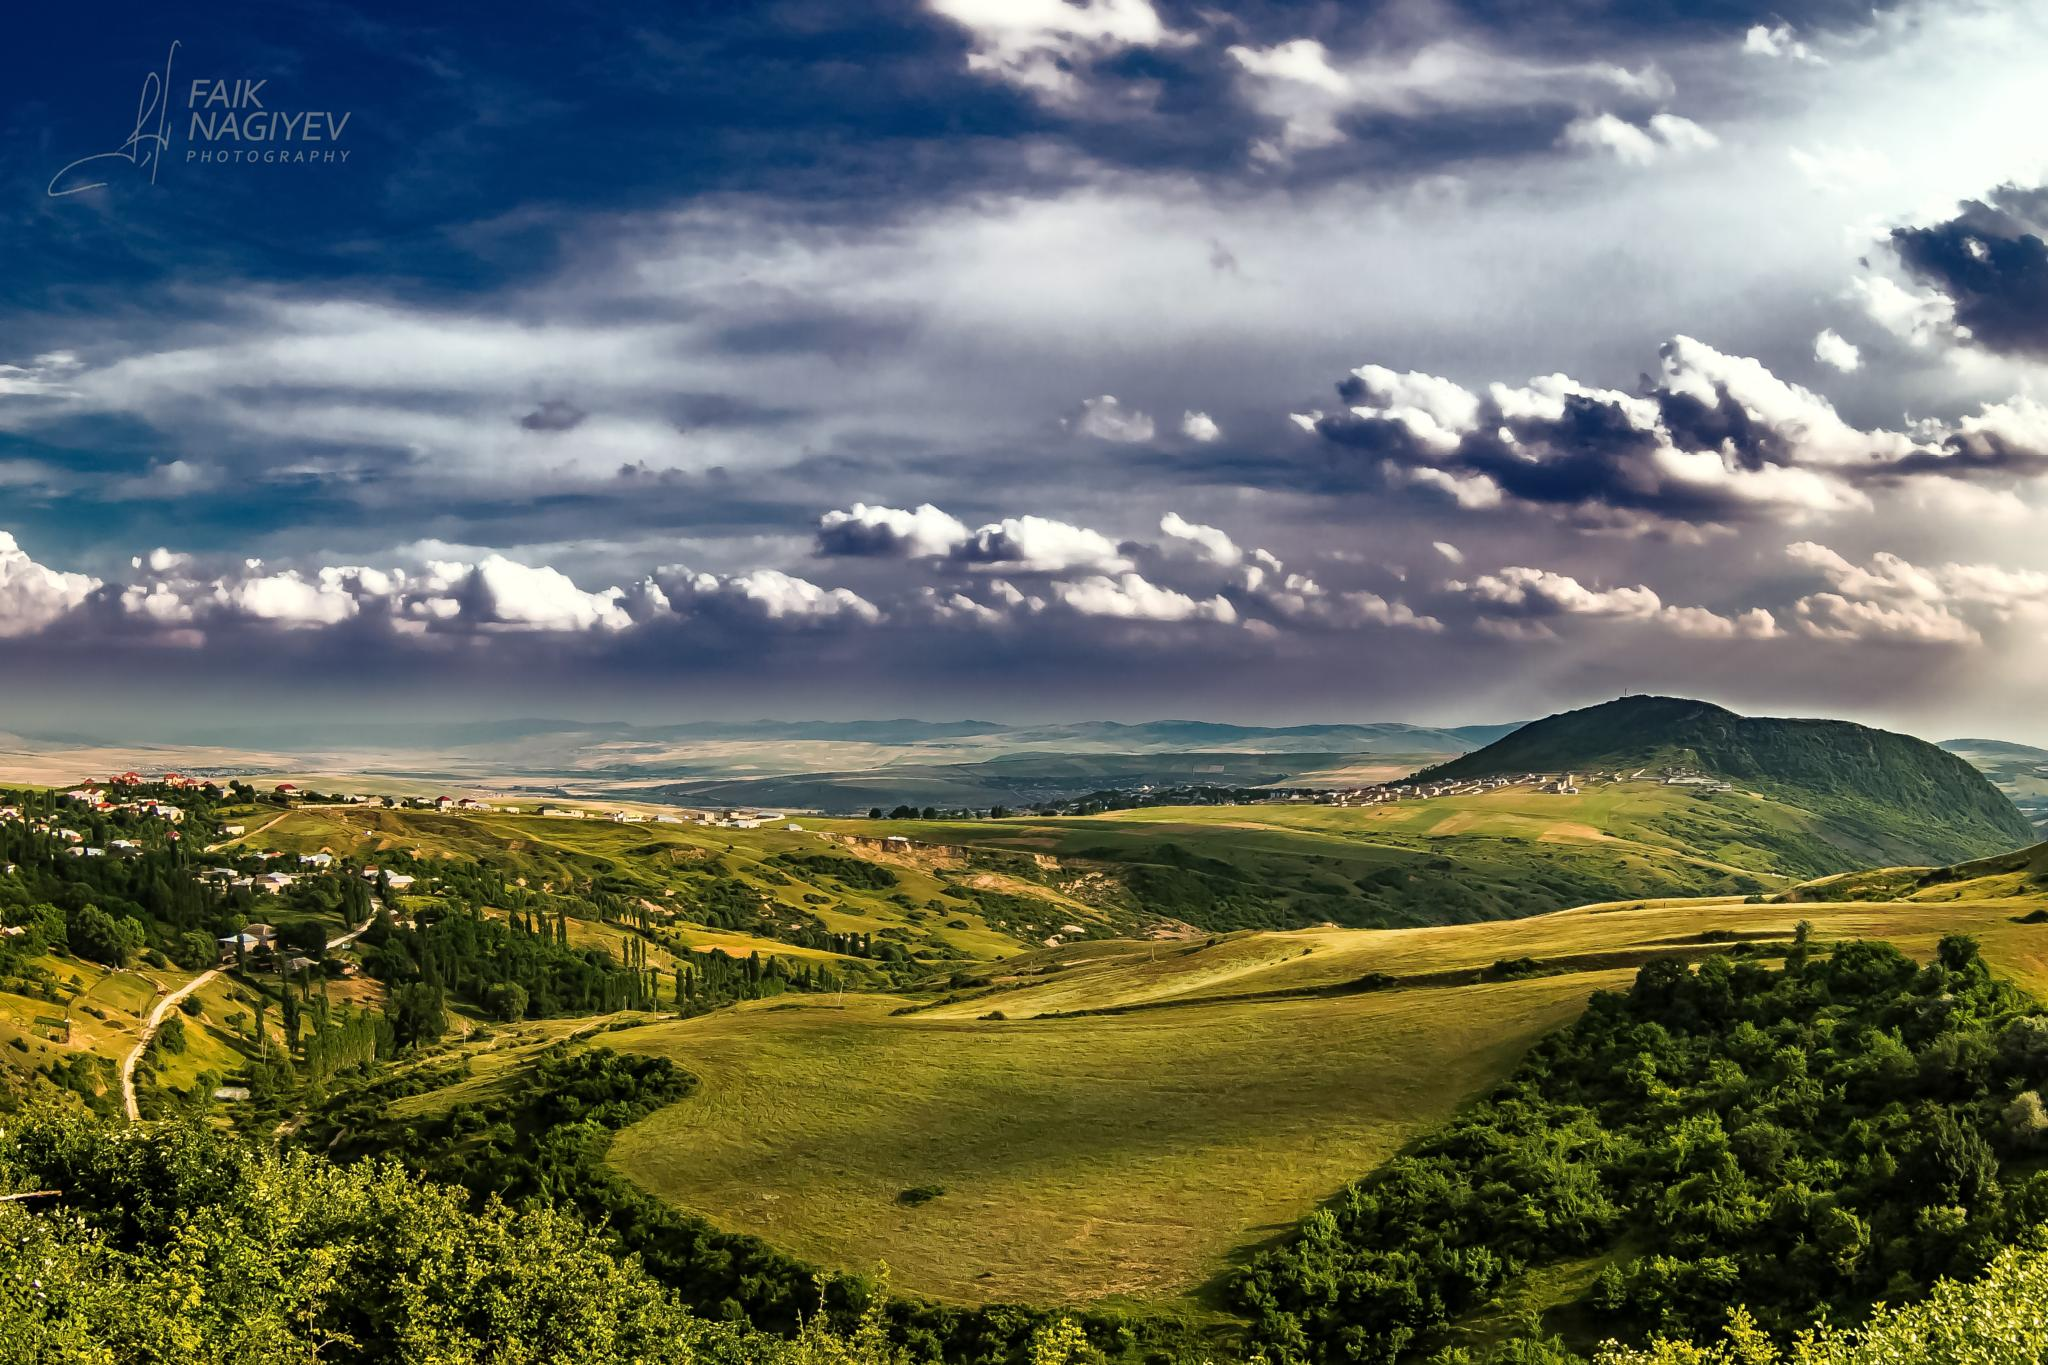 Priquli panorama by Faik Nagiyev